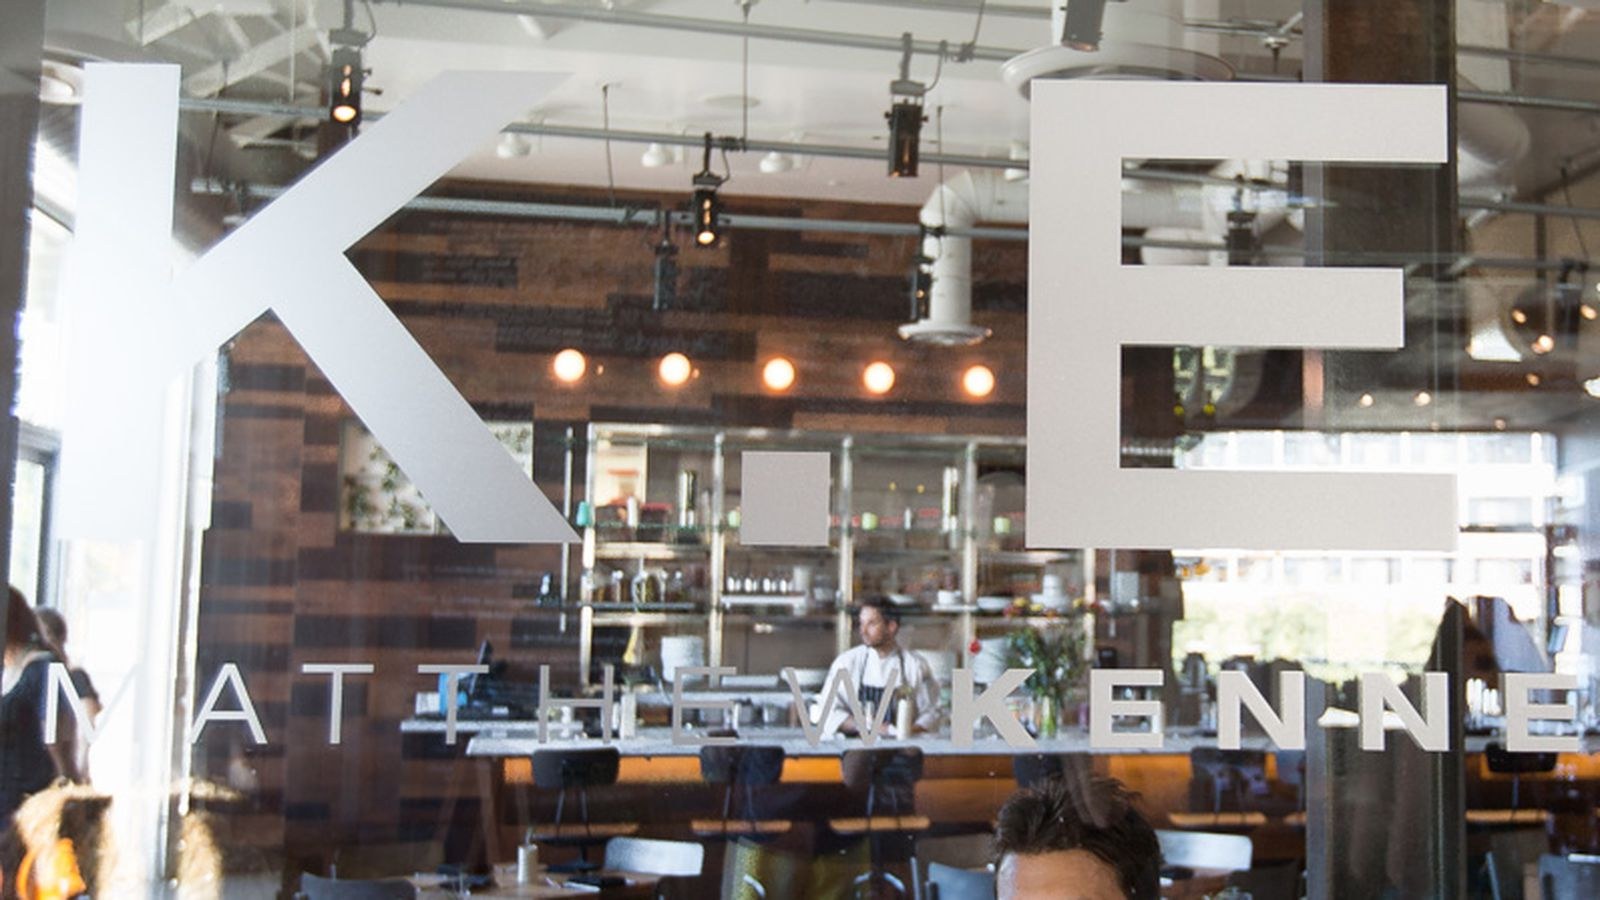 Matthew Kenney å lukke M. A. K. E. i Santa Monica Place, Open New Concept i Venezia